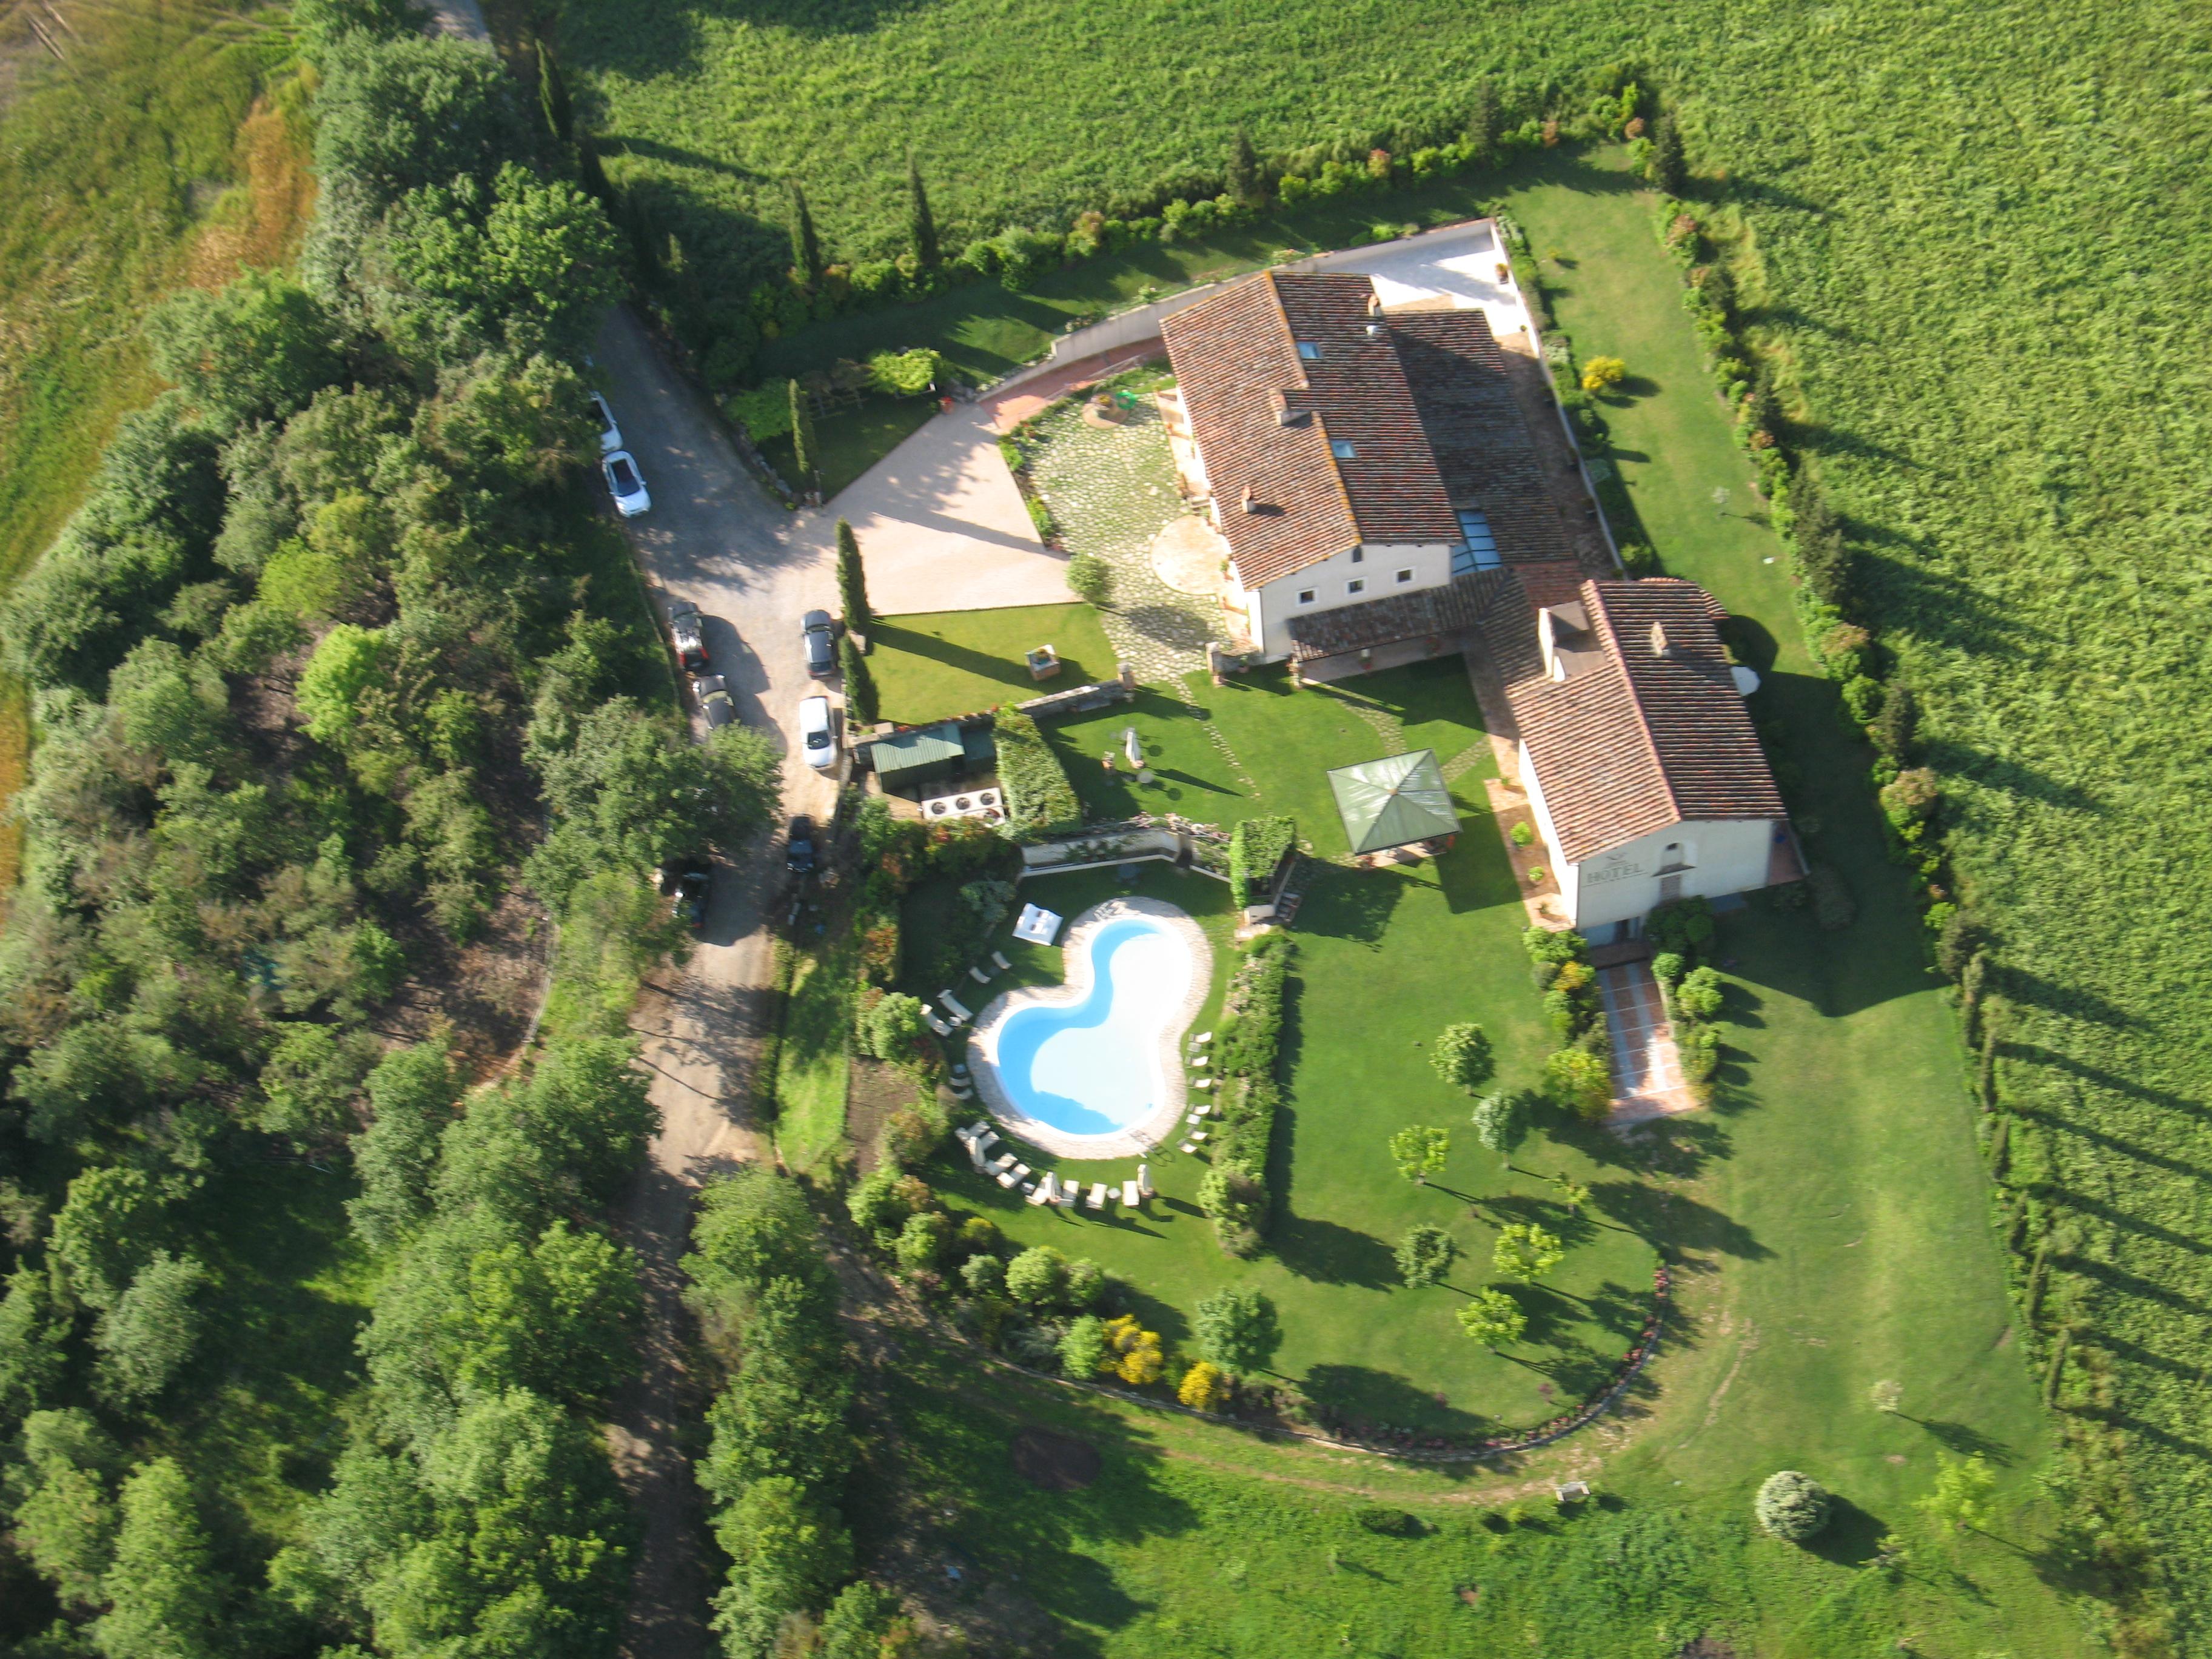 hotel swimming pool in bagno vignoni